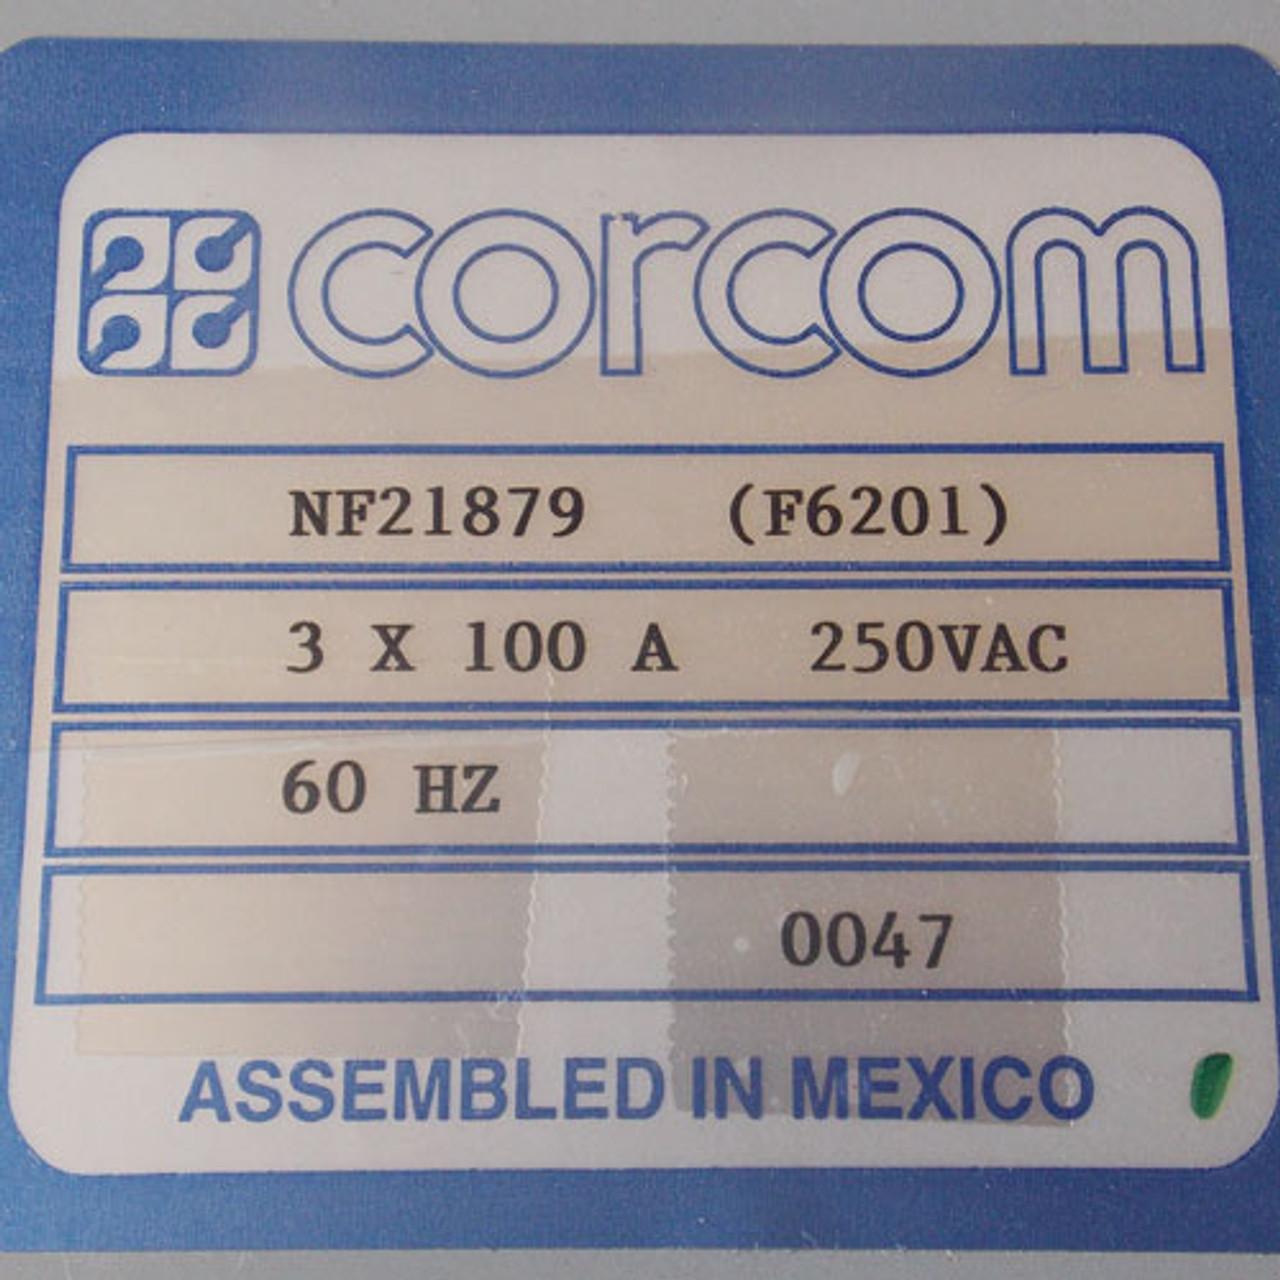 Corcom NF21879 (F6201) EMI Filter 3 x 100 Amps, 250 VAC 60Hz - Used